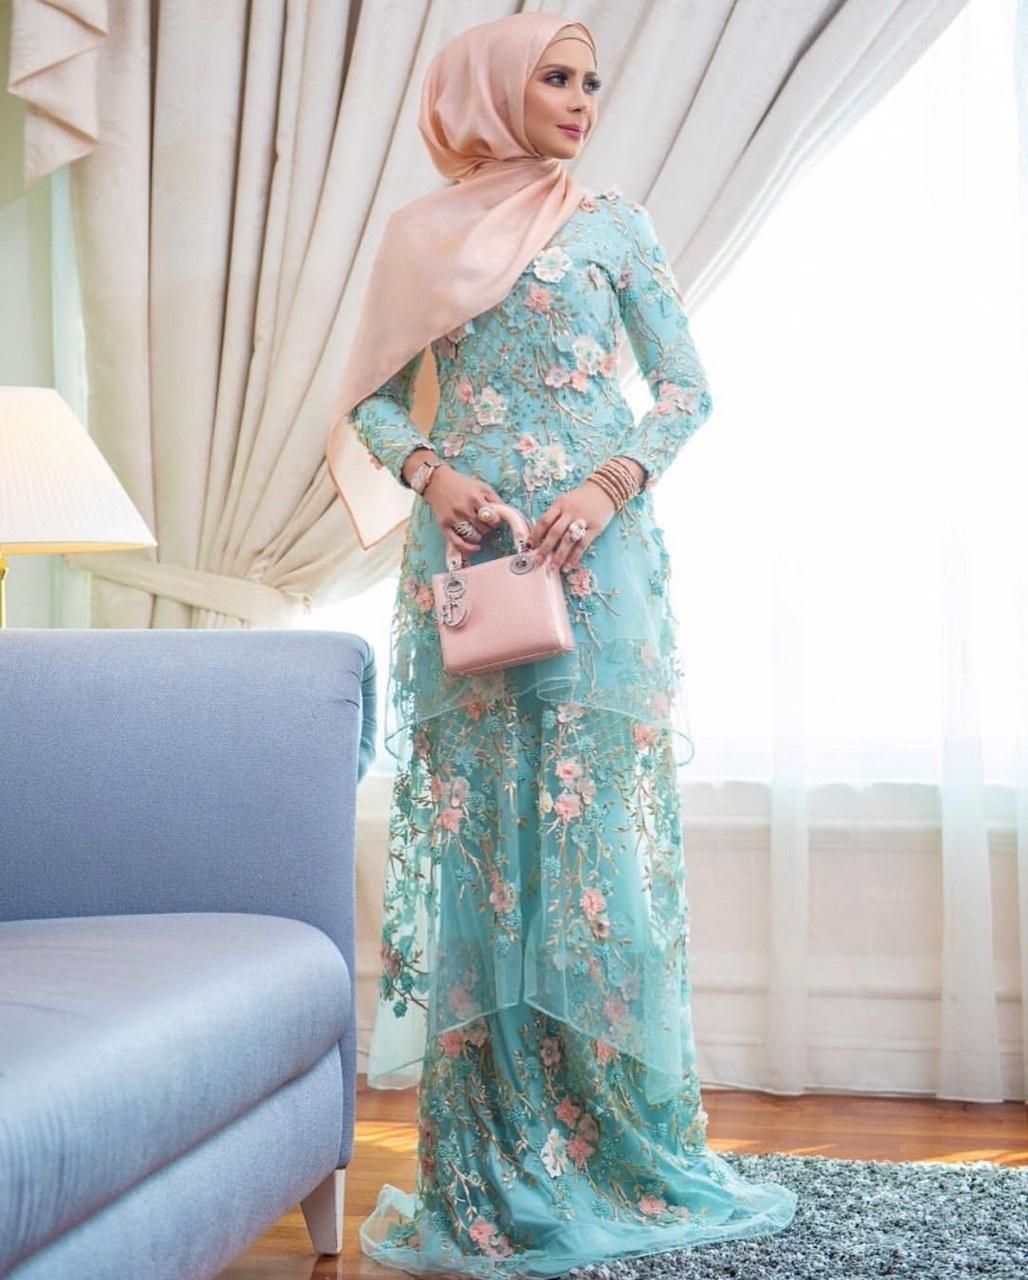 Model Gaya Baju Lebaran 2019 3ldq Ide Populer 38 Baju Raya Artis 2019